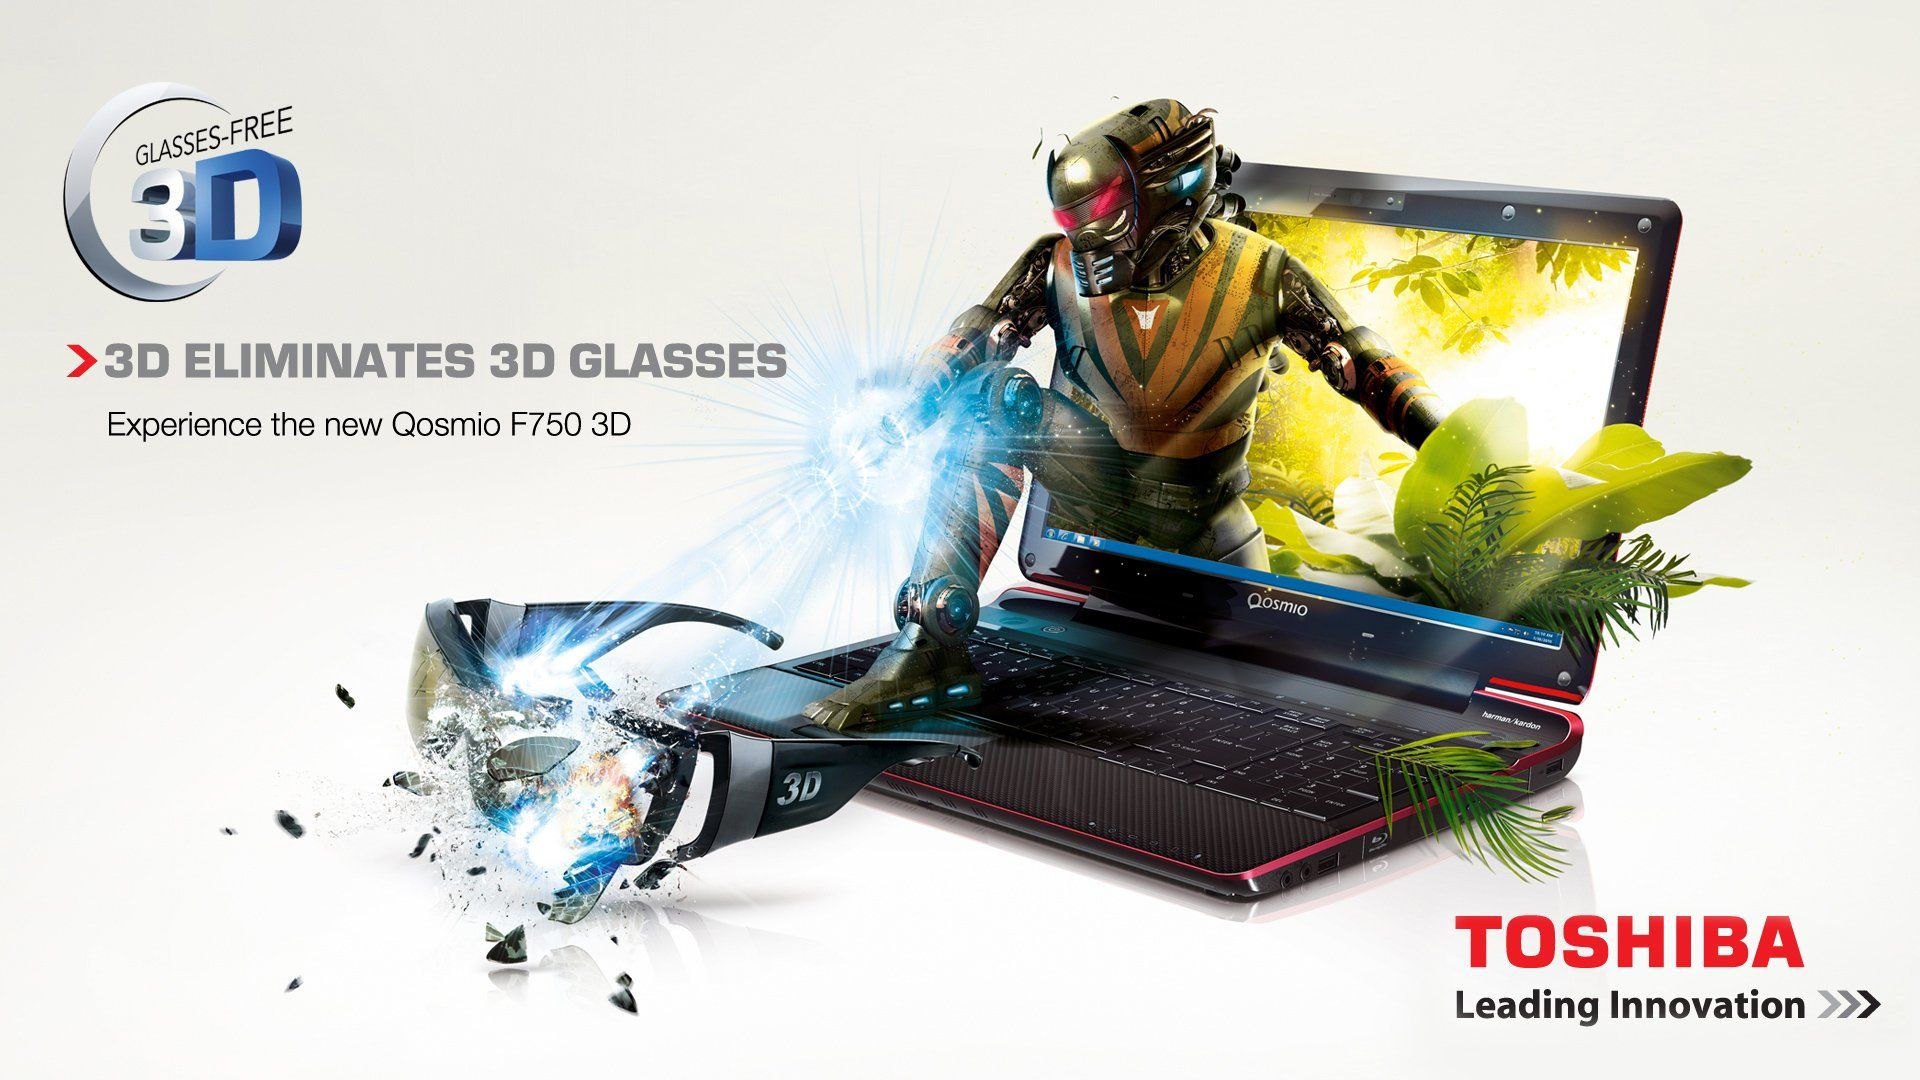 toshiba-laptop-ad